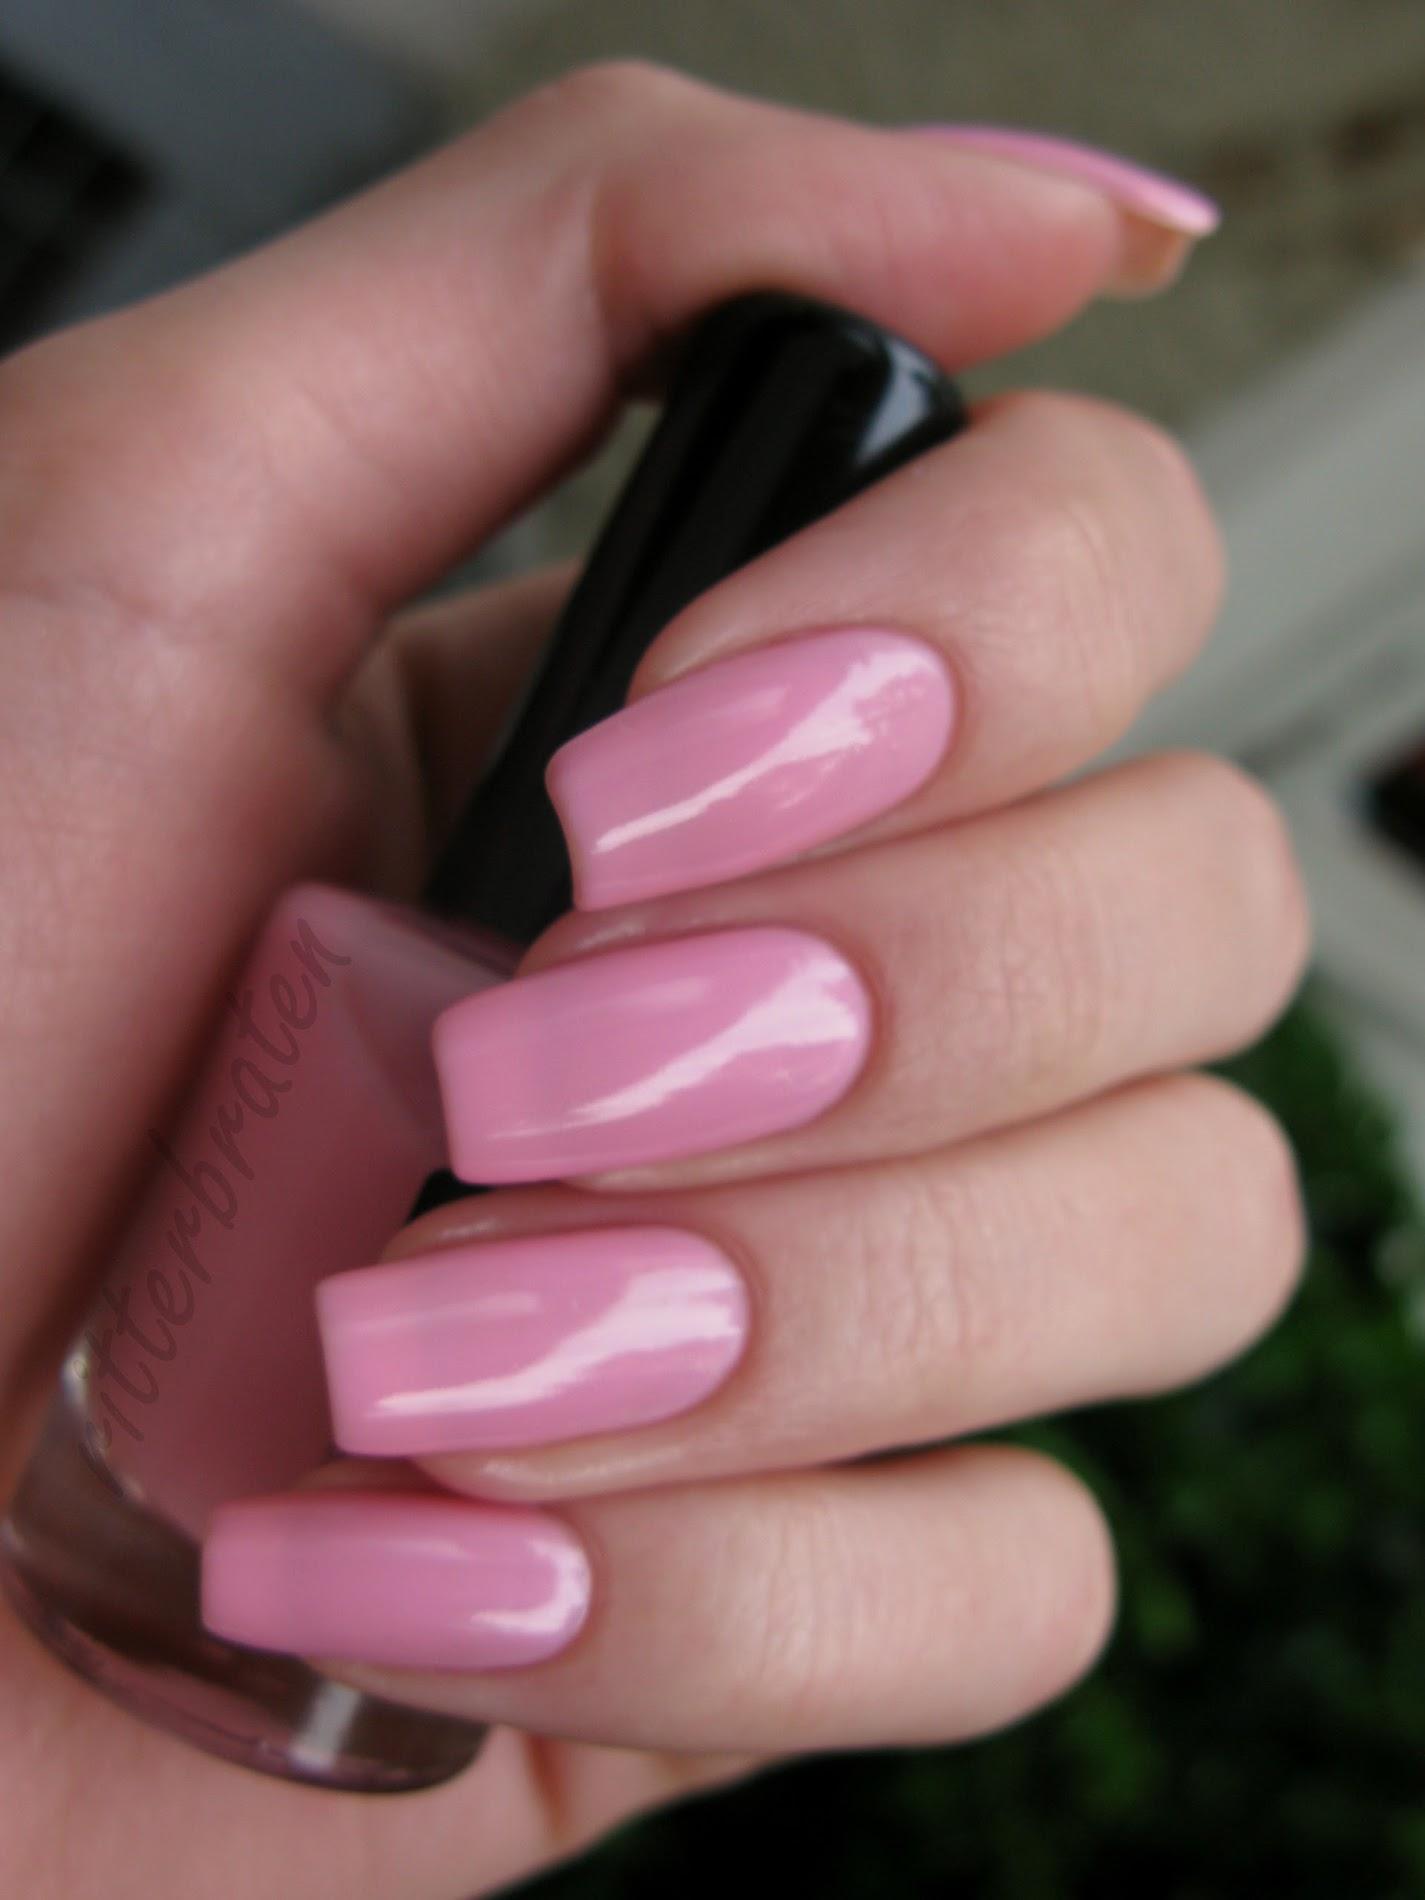 Cliché Sonho verniz swatch nail polish